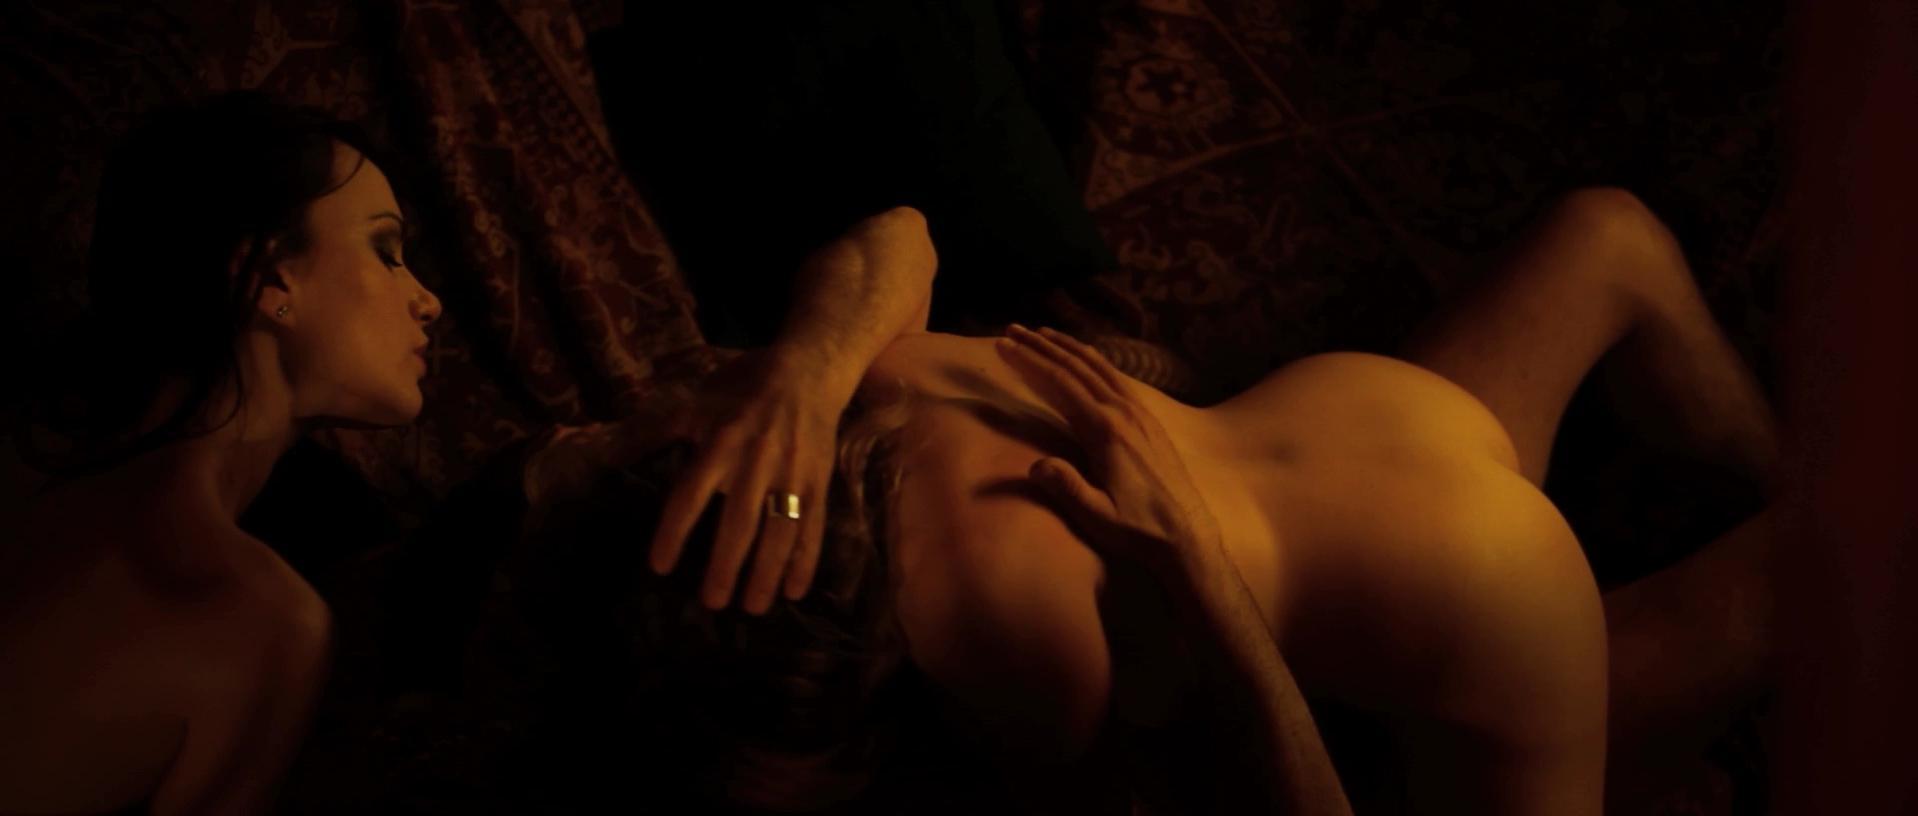 Claudia Gerini nude, Crisula Stafida nude - Tulpa: Perdizioni mortali (2012)